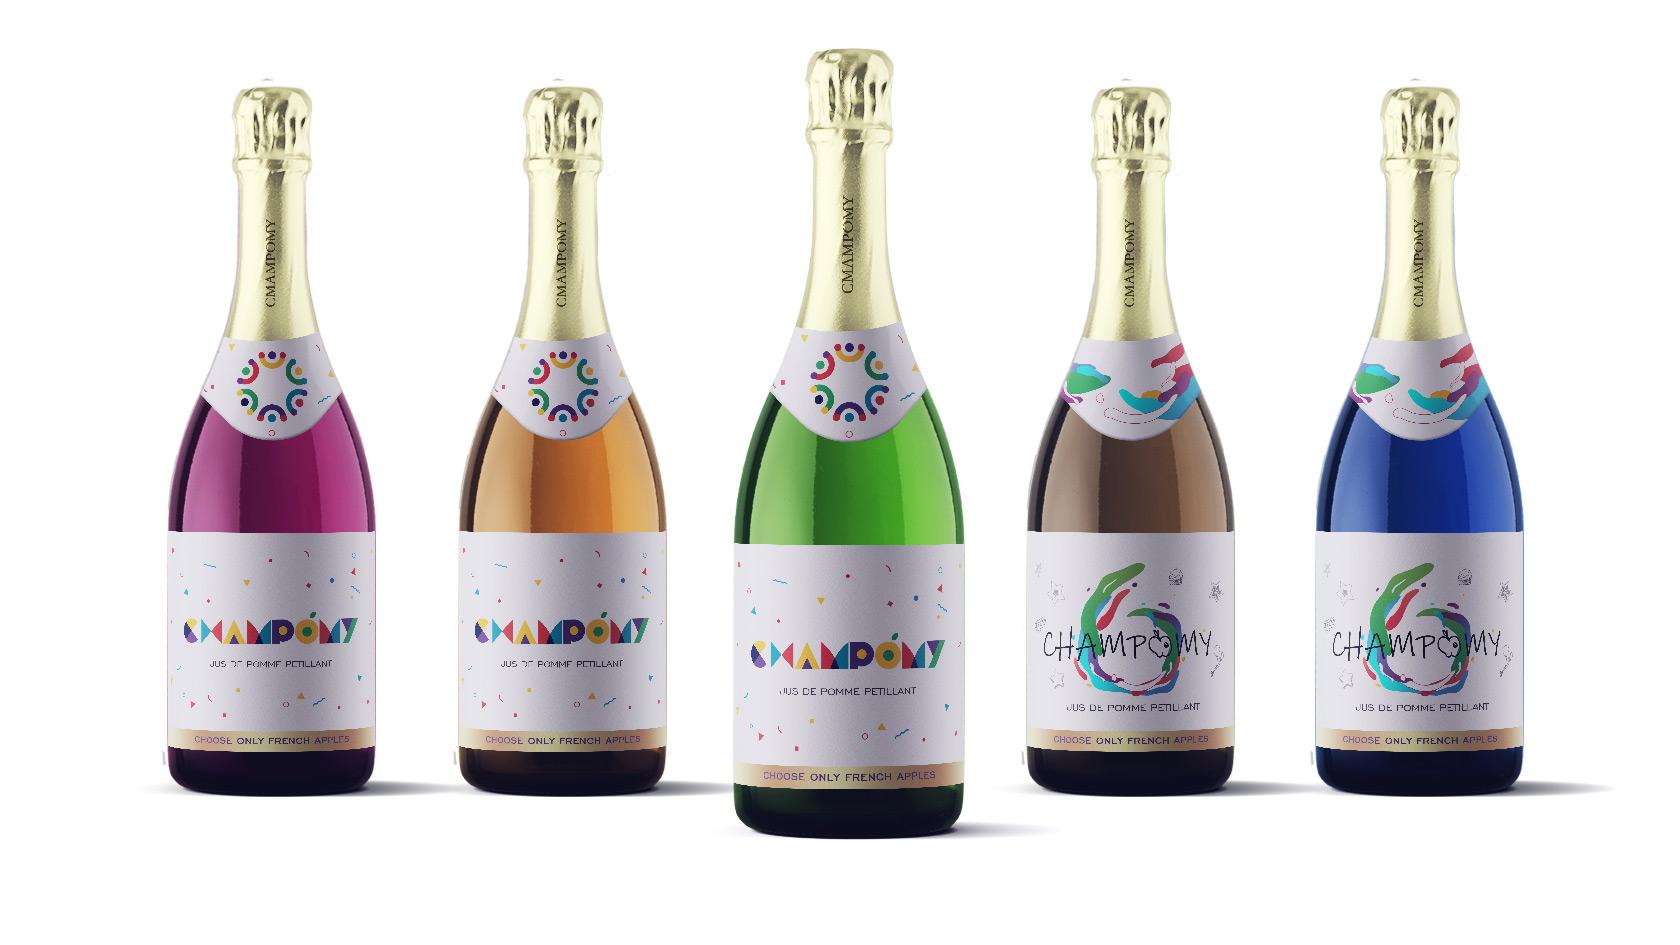 香槟logo10